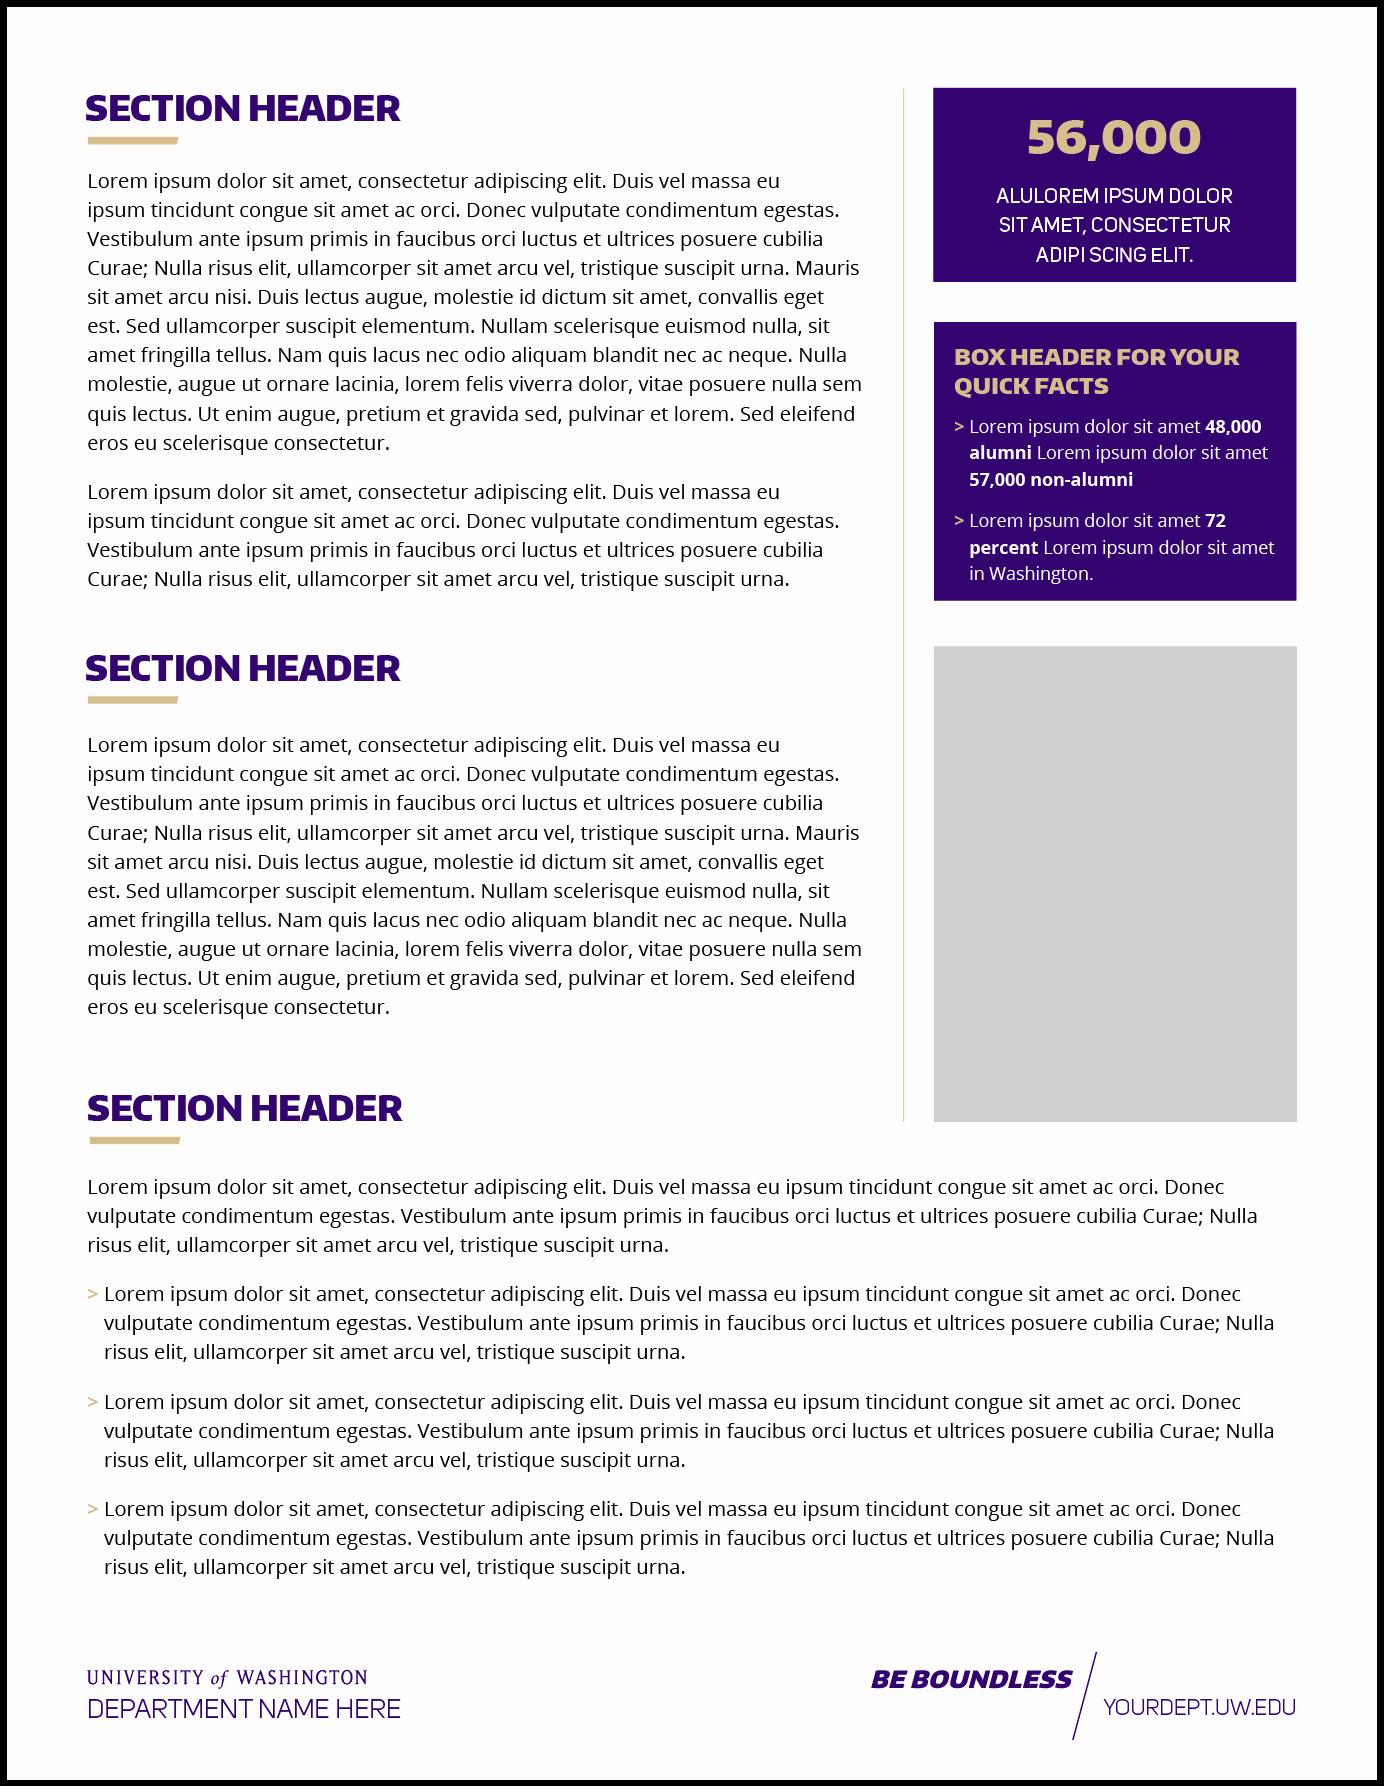 Fact Sheet Templates Microsoft Word Lovely Fact Sheet